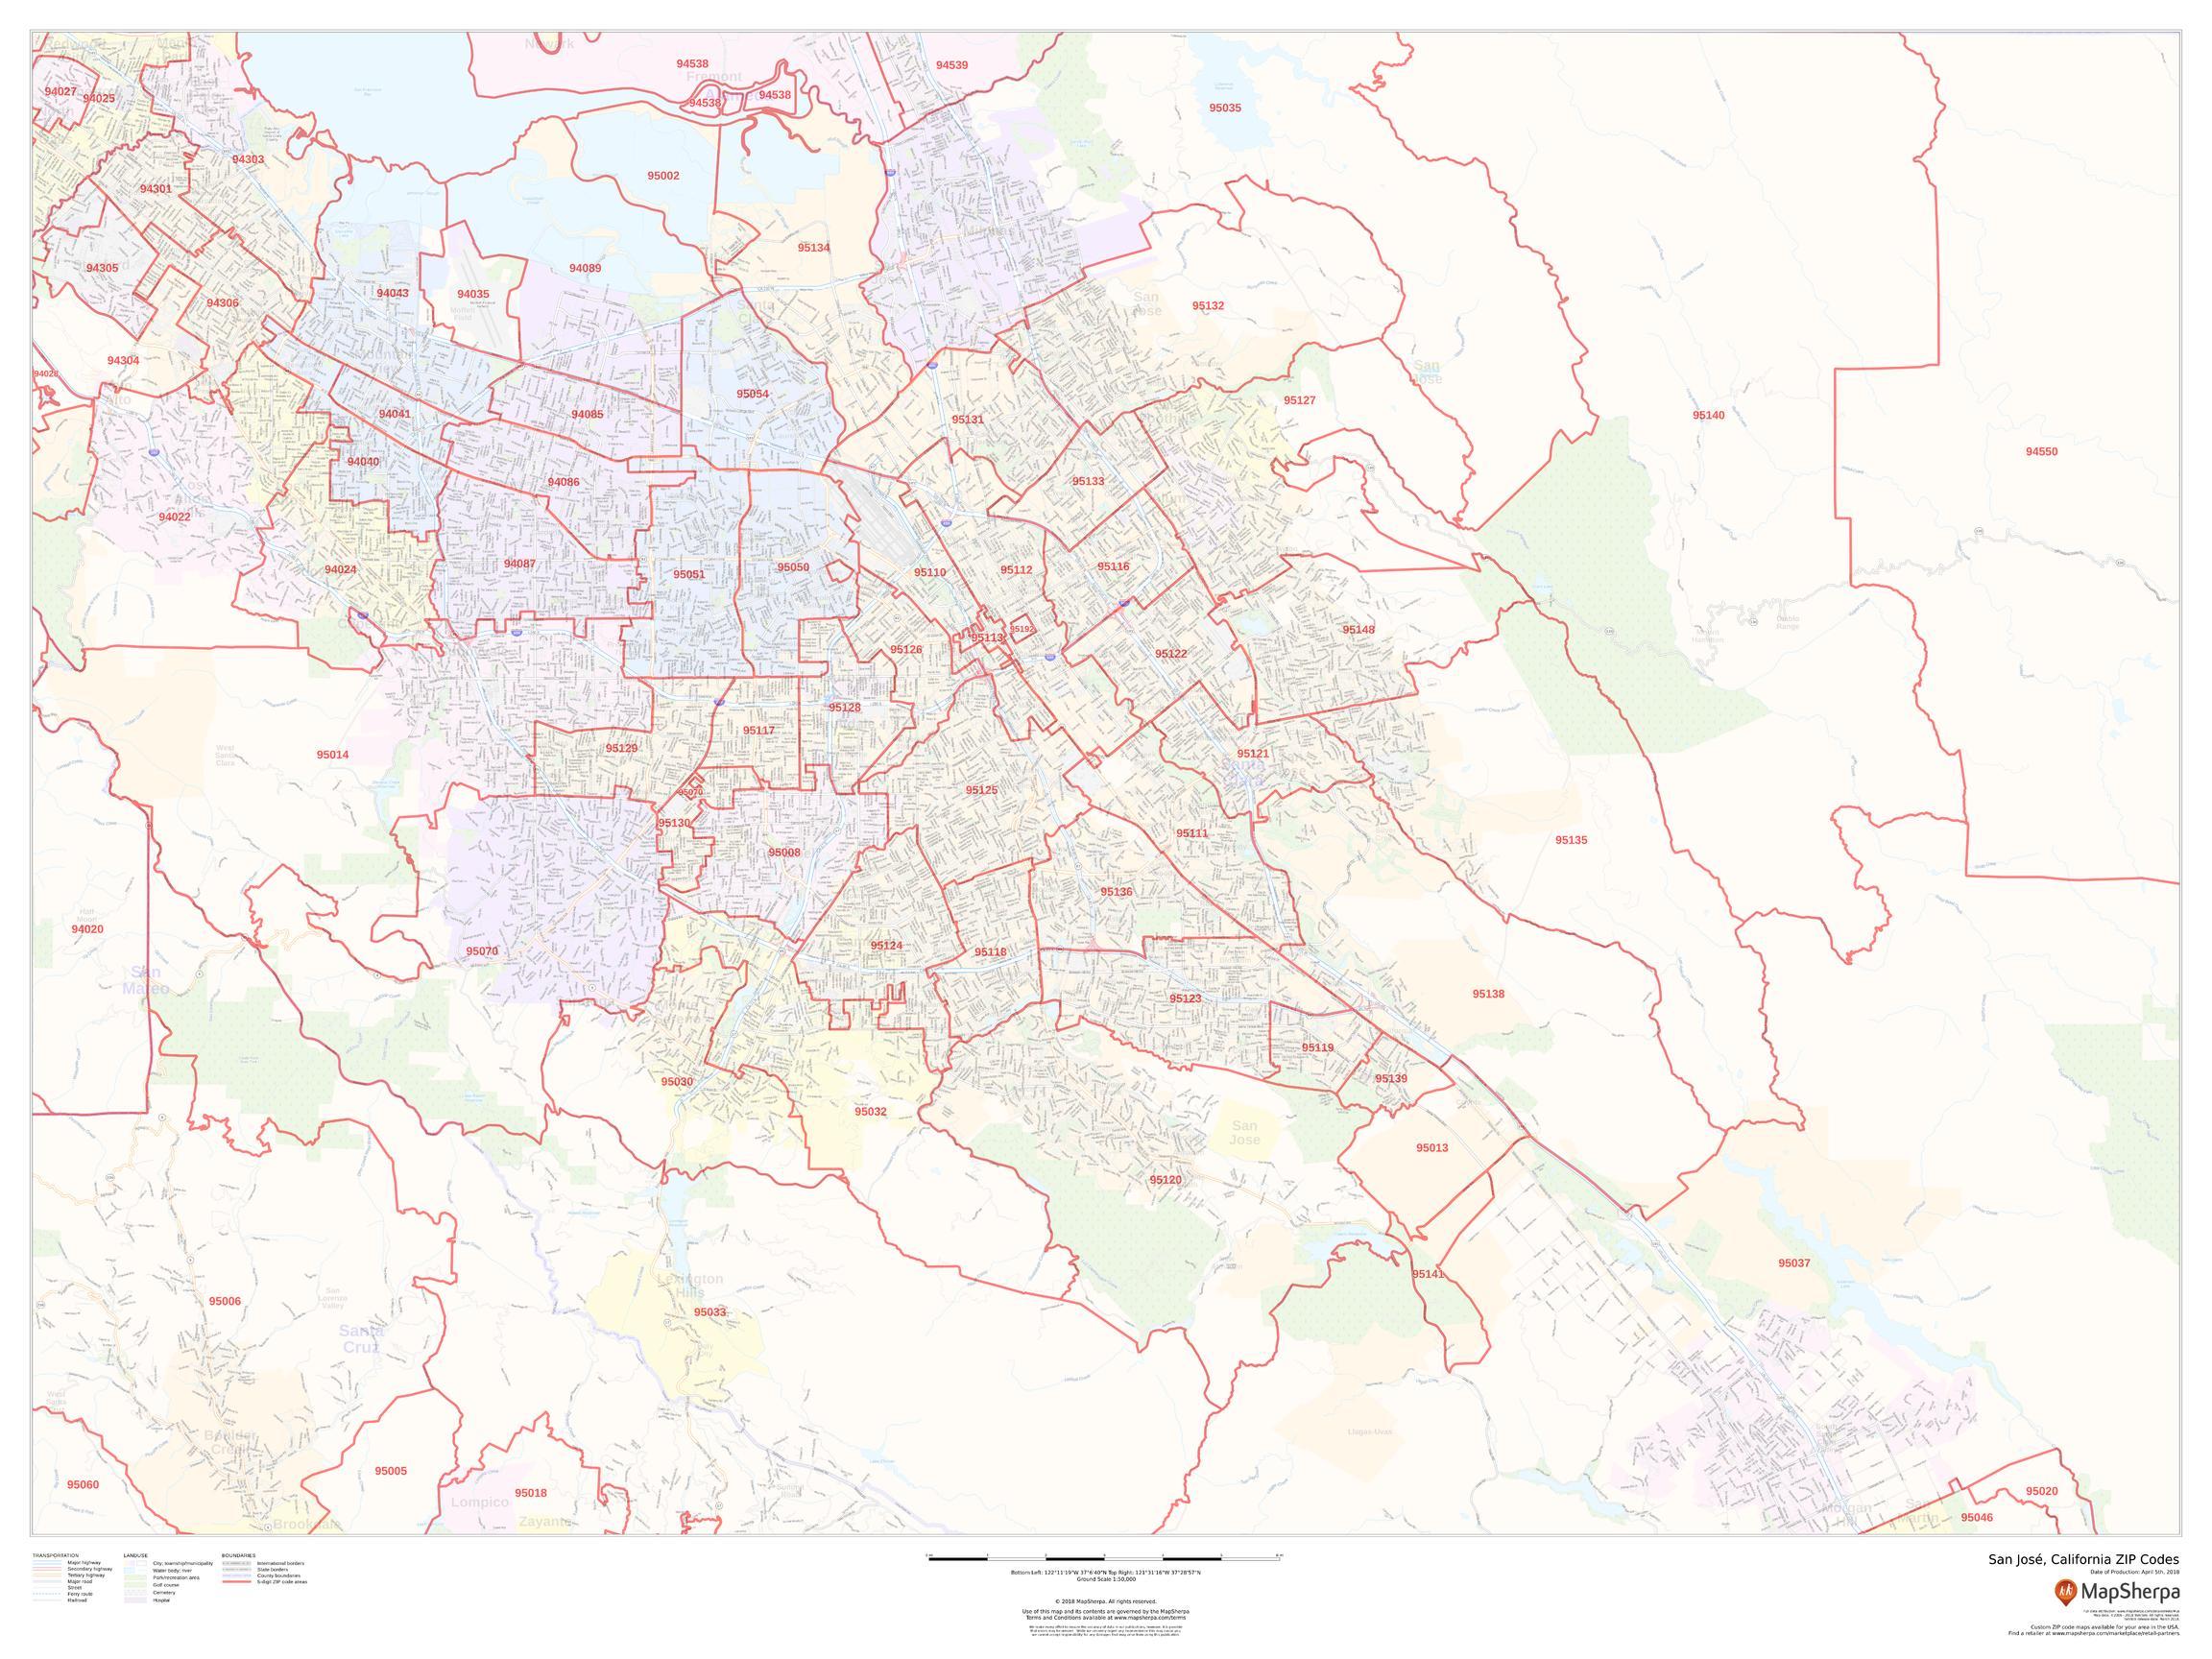 San Jose CA ZIP Code Map Laminated